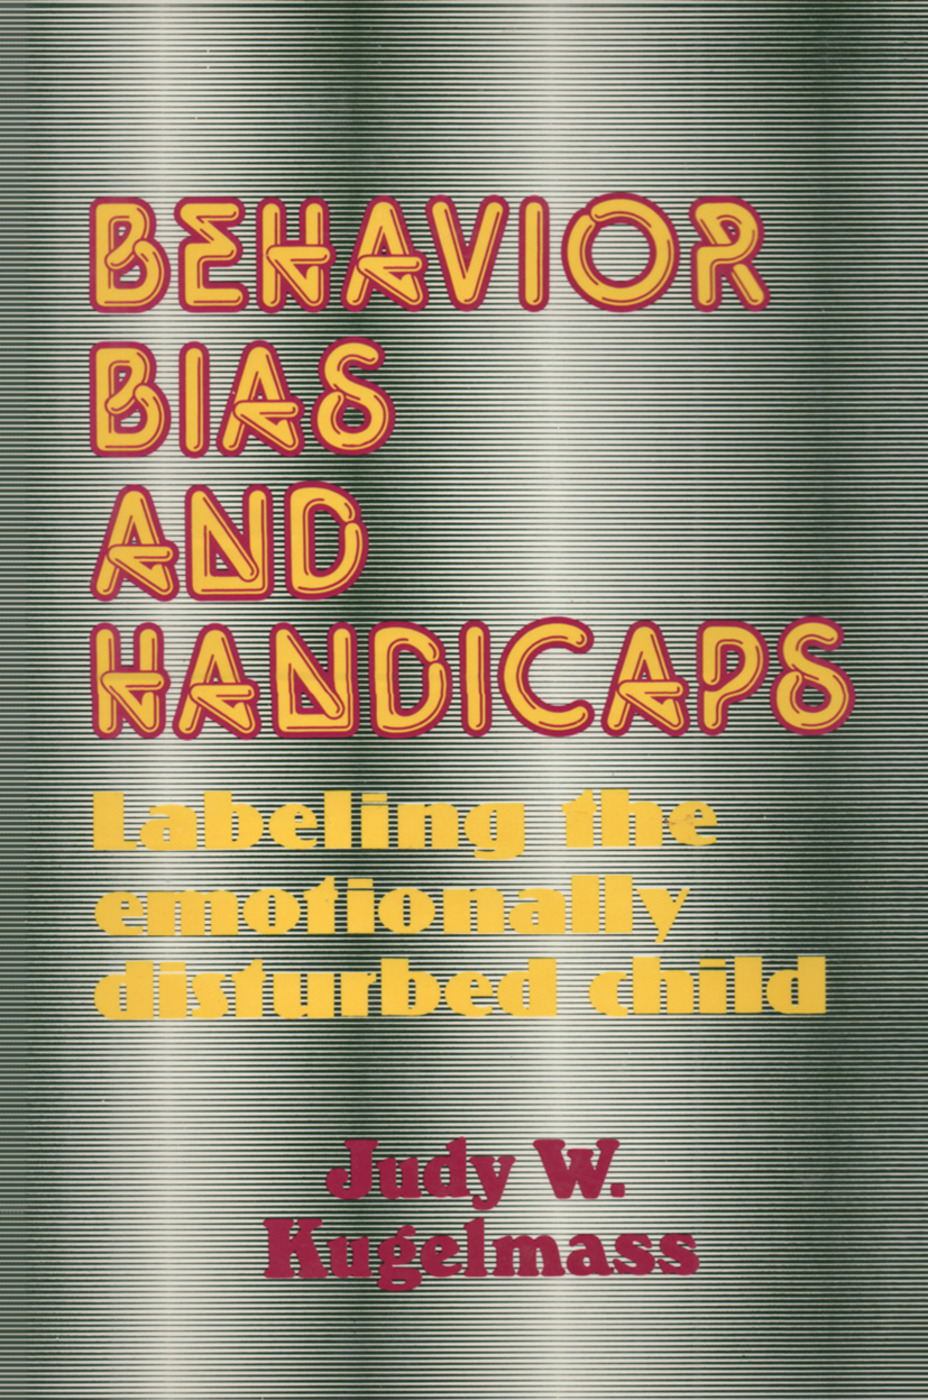 Behavior, Bias and Handicaps